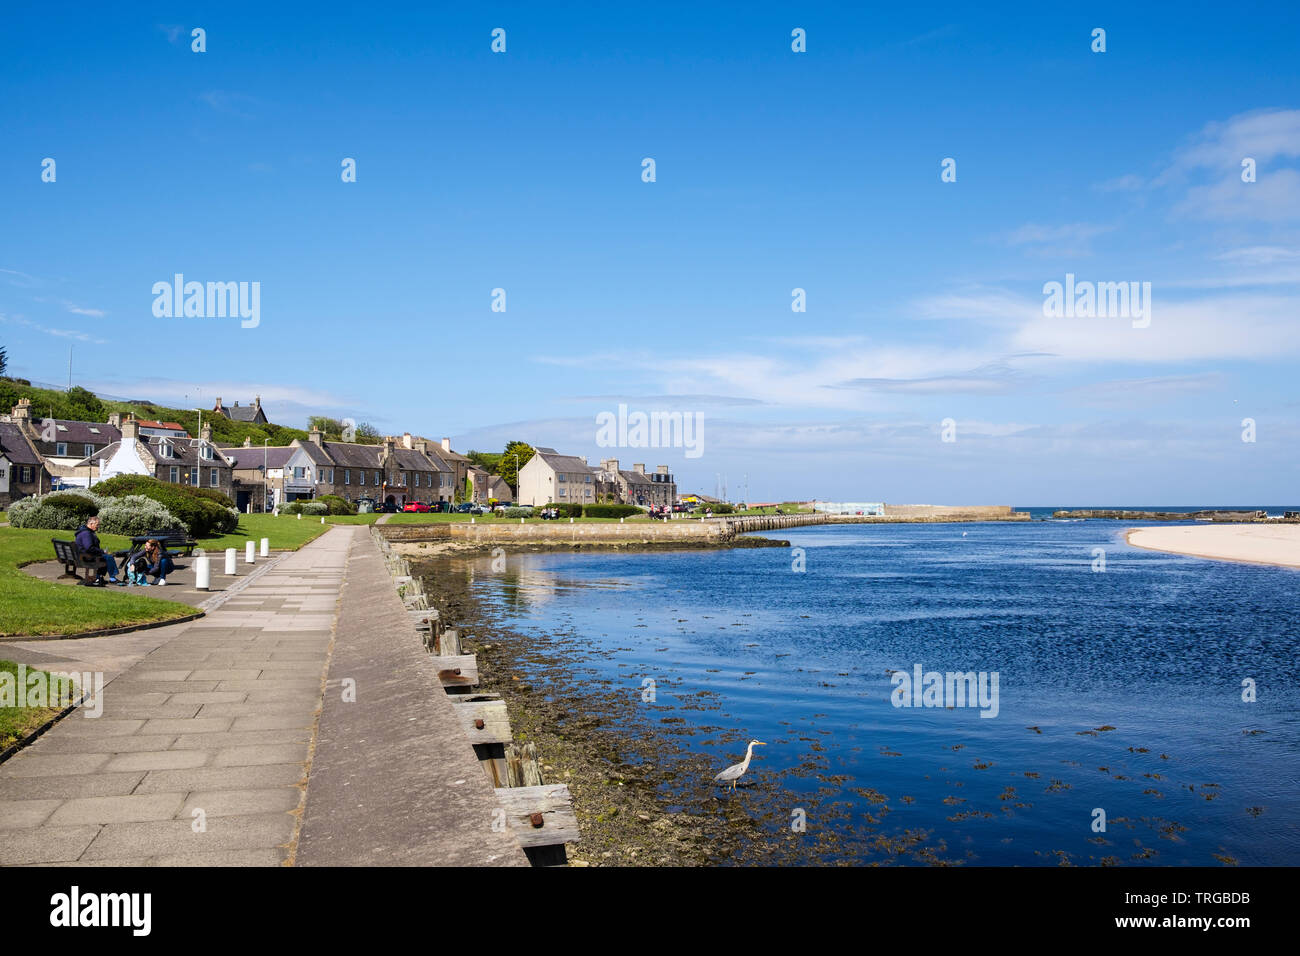 View along waterfront promenade beside Lossie River mouth on Moray Firth coast. Lossiemouth, Moray, Scotland, UK, Britain - Stock Image